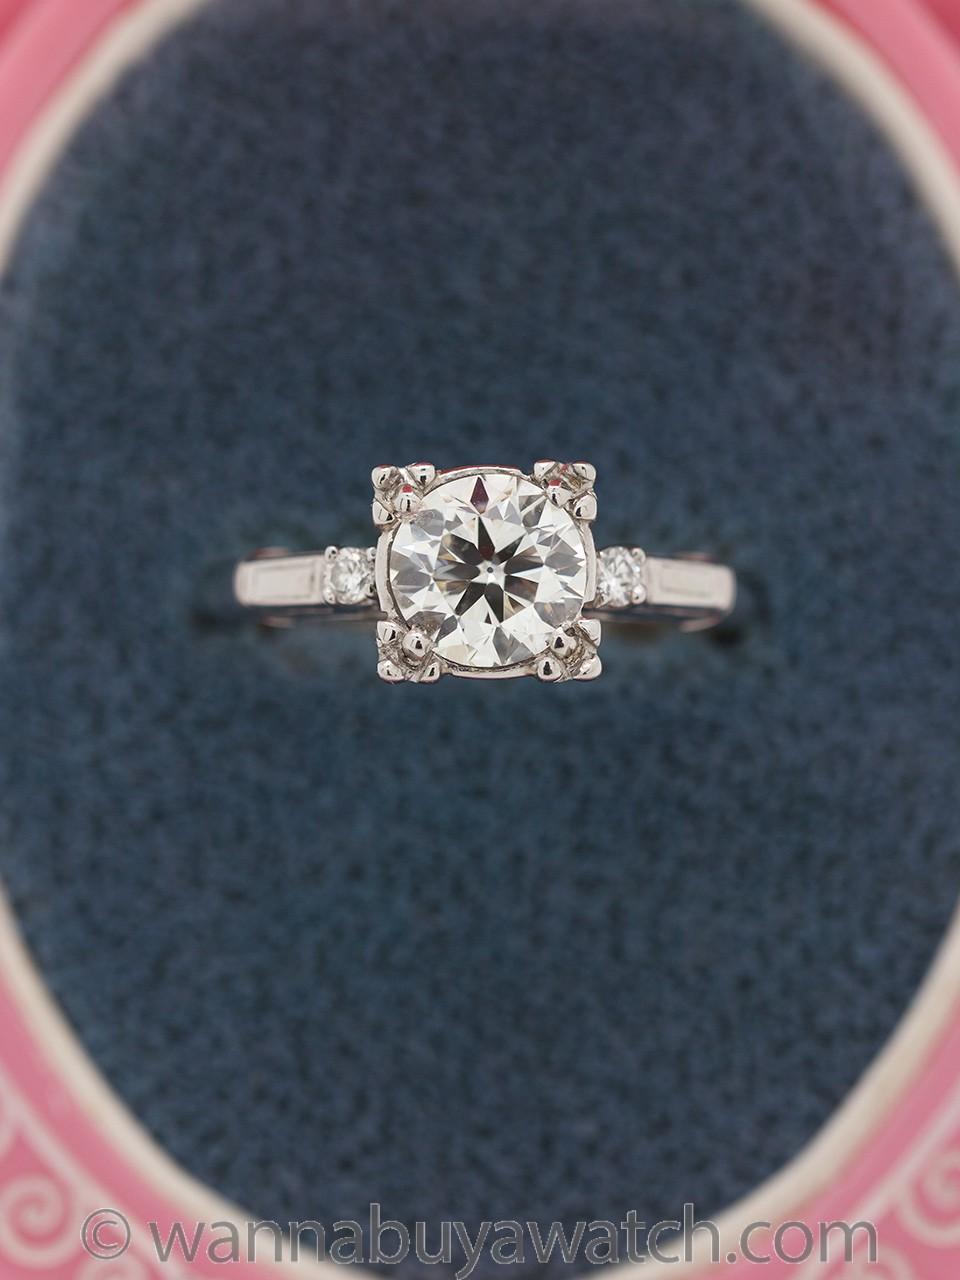 Vintage Engagement Ring Platinum 1.17ct Transitional Cut I-VS2 circa 1950s